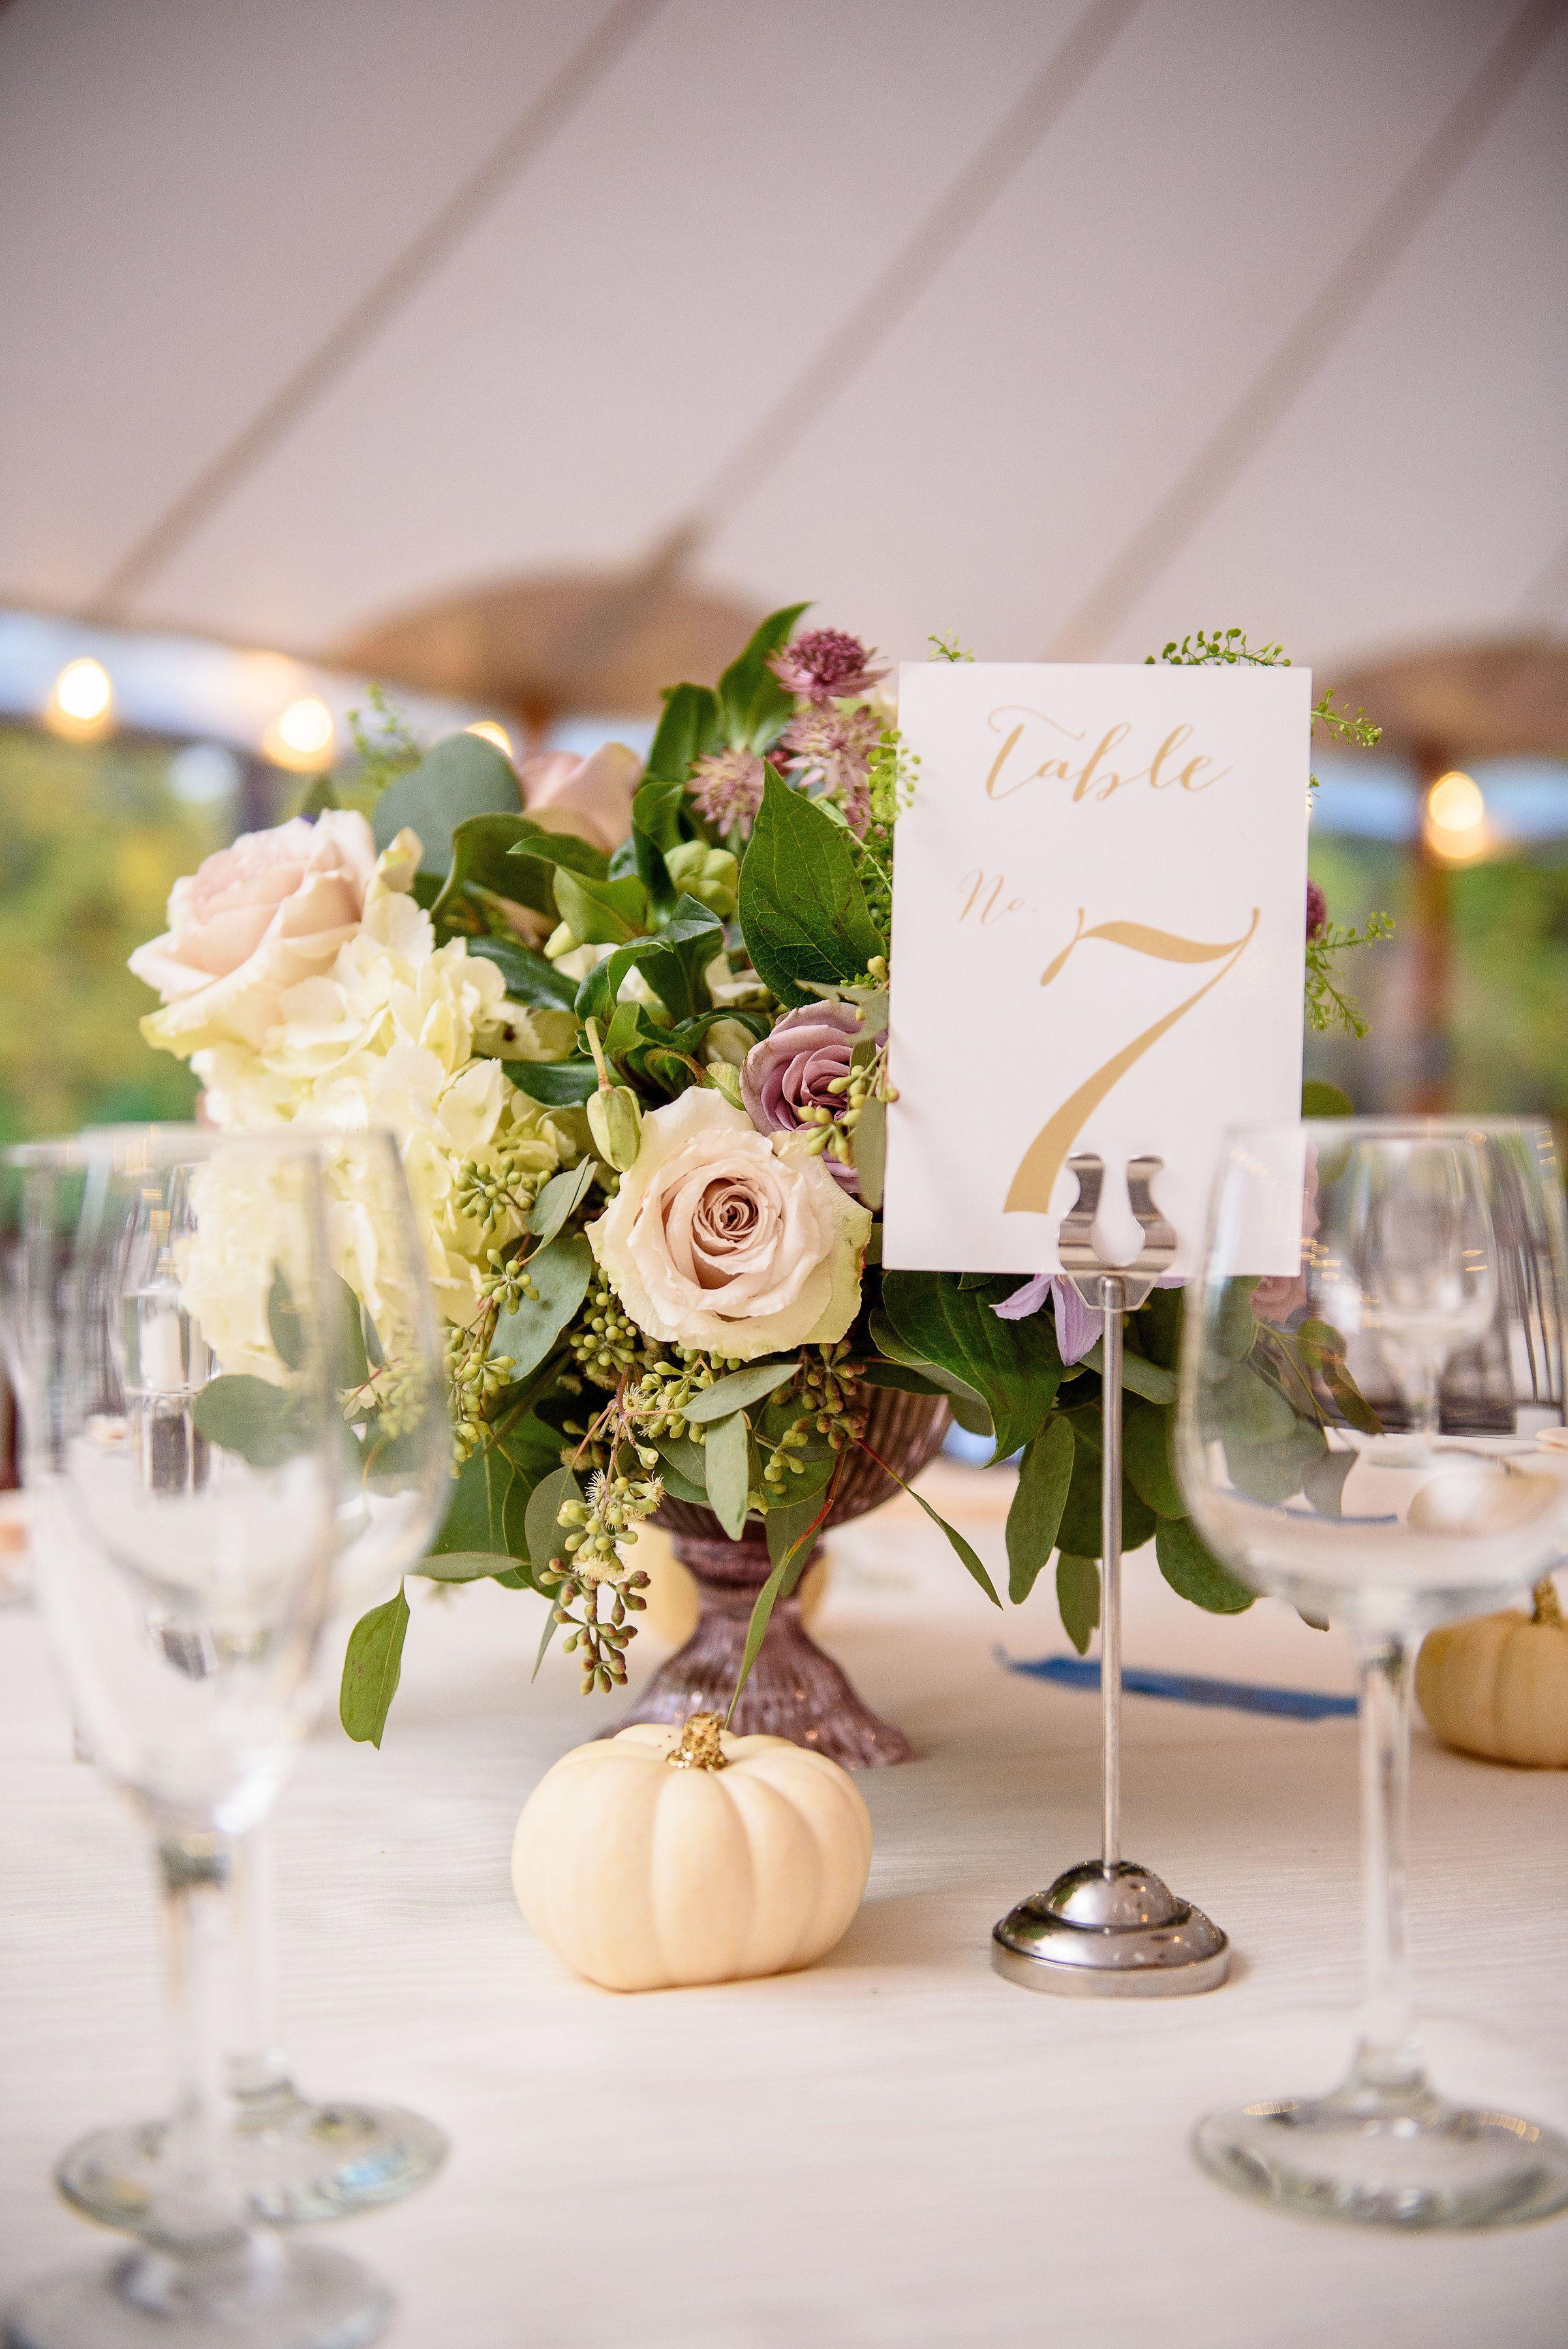 Wedding Reception At Willowdale Estate Boston Massachusetts Blush Wedding Centerpieces Fall Wedding Reception Decorations Wedding Reception Centerpieces Fall